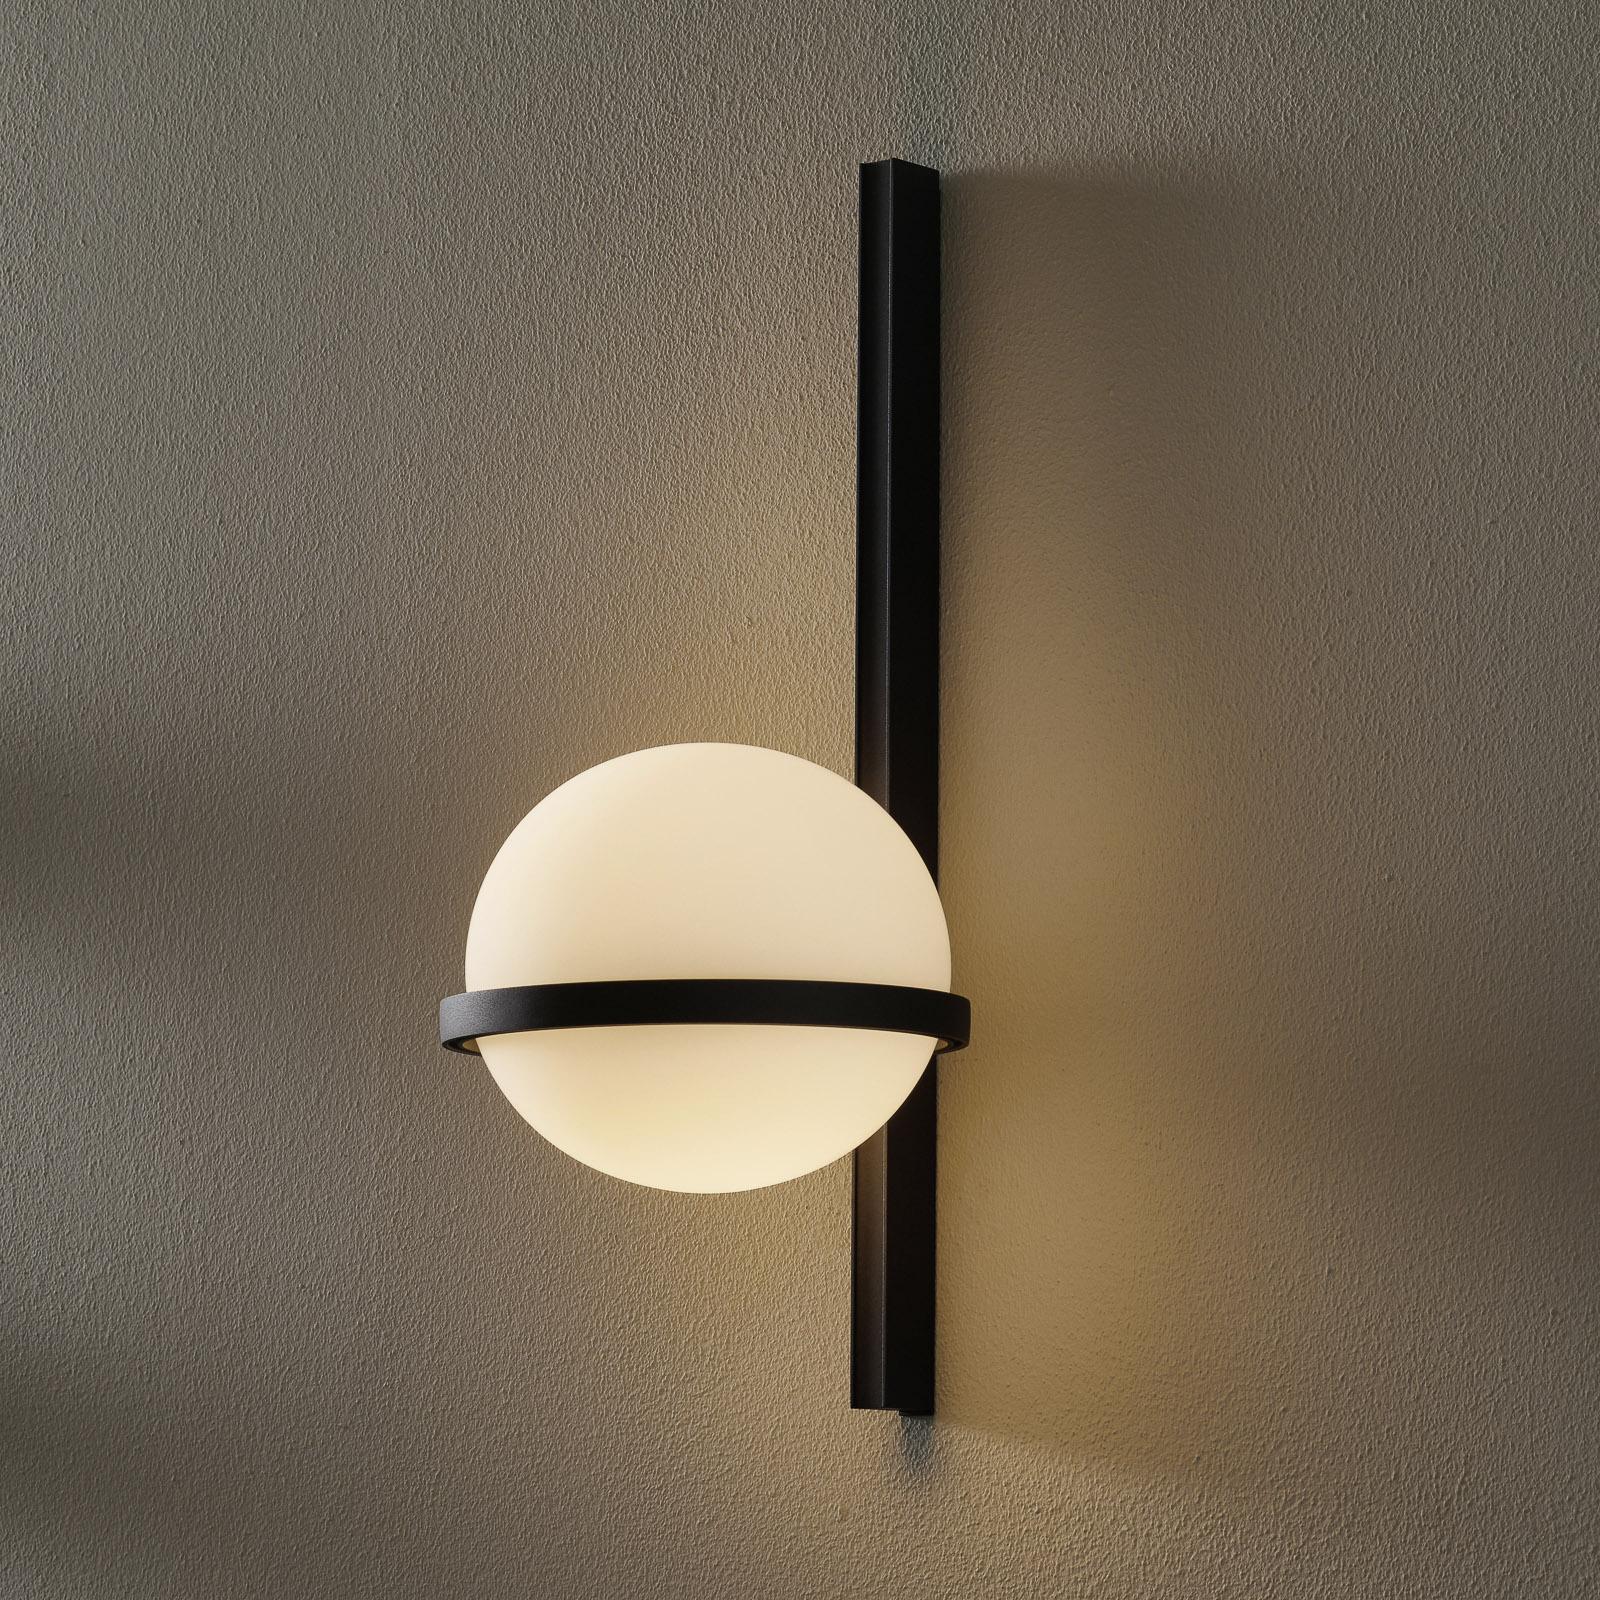 Vibia Palma 3710 LED-Wandleuchte, grafit